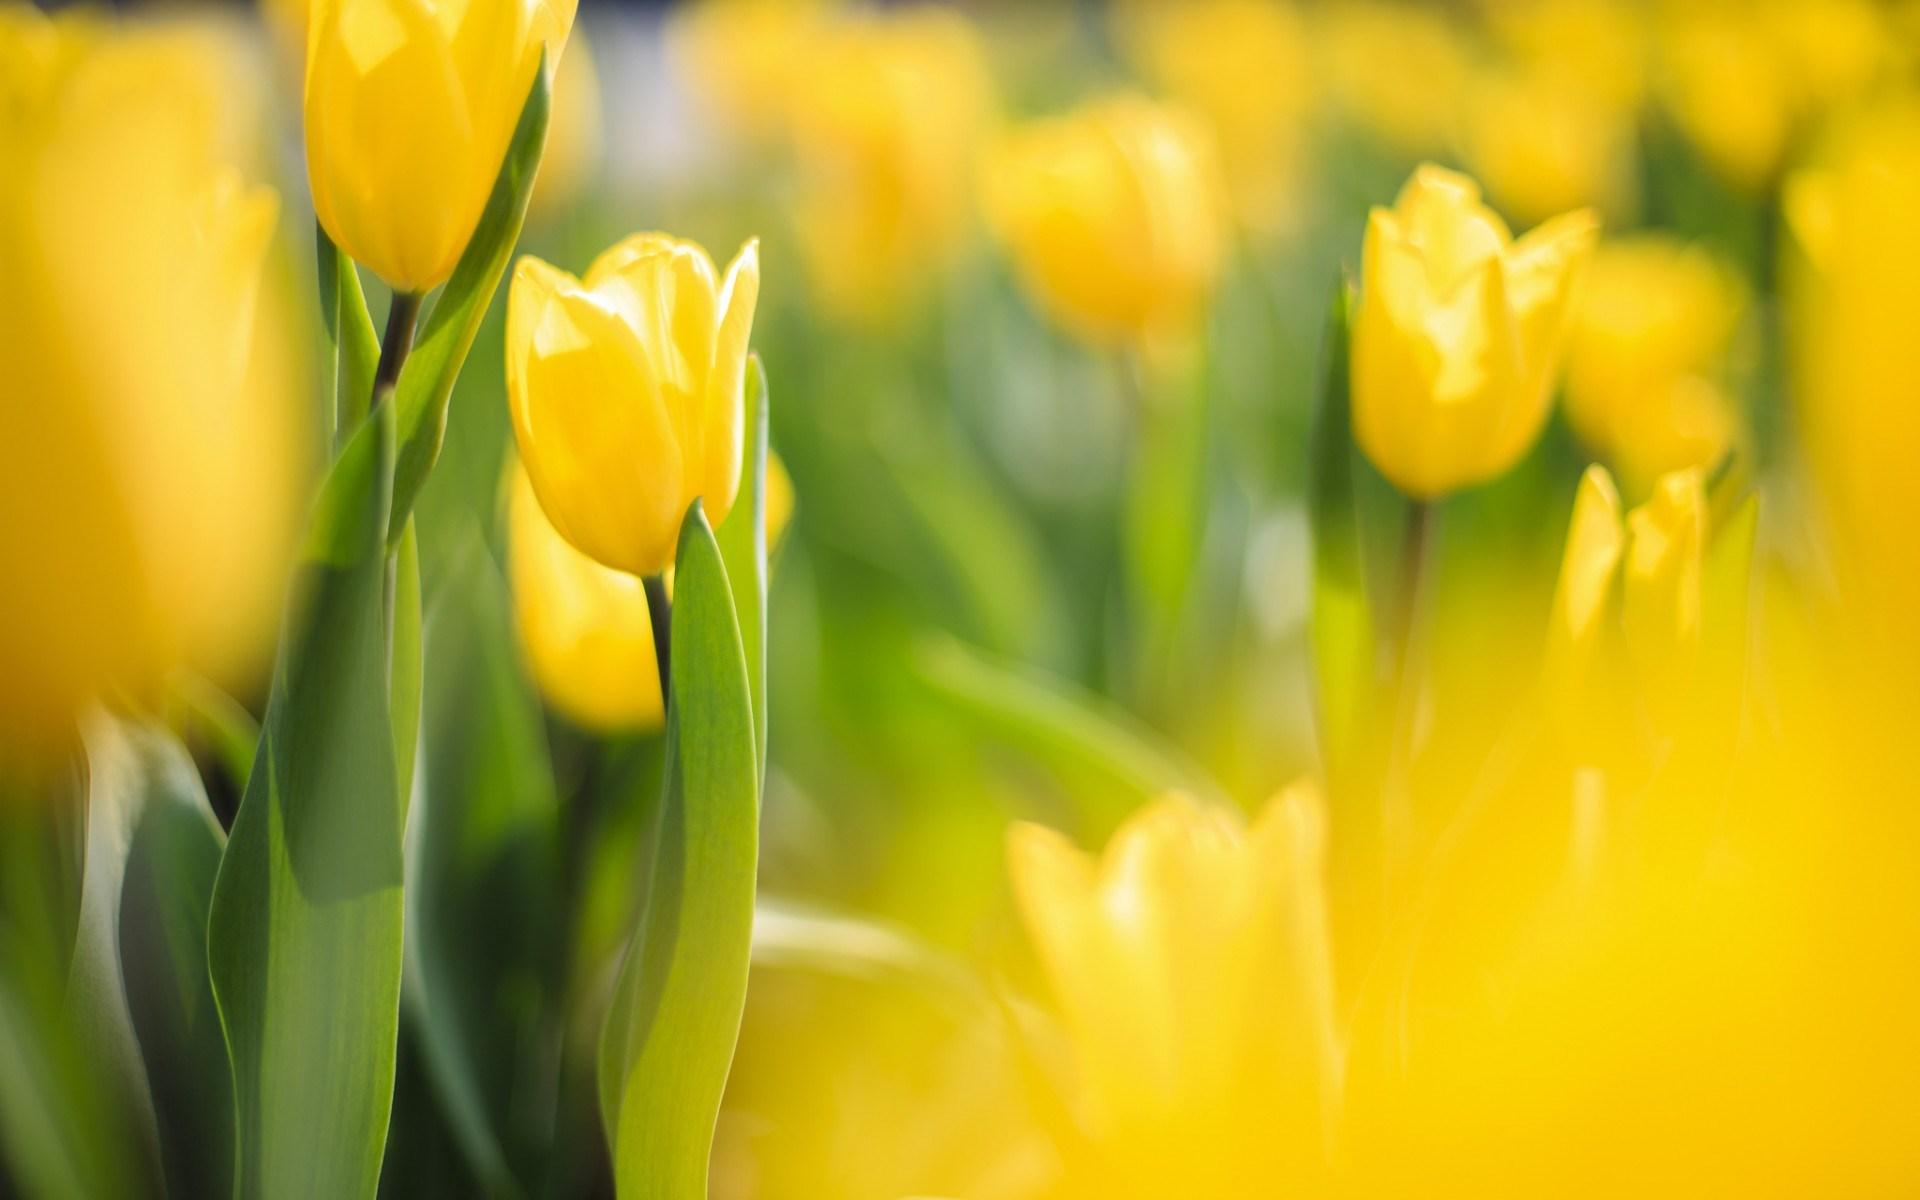 spring-tulip-flowers-yellow-macro-blur-photo-nature-hd-wallpaper